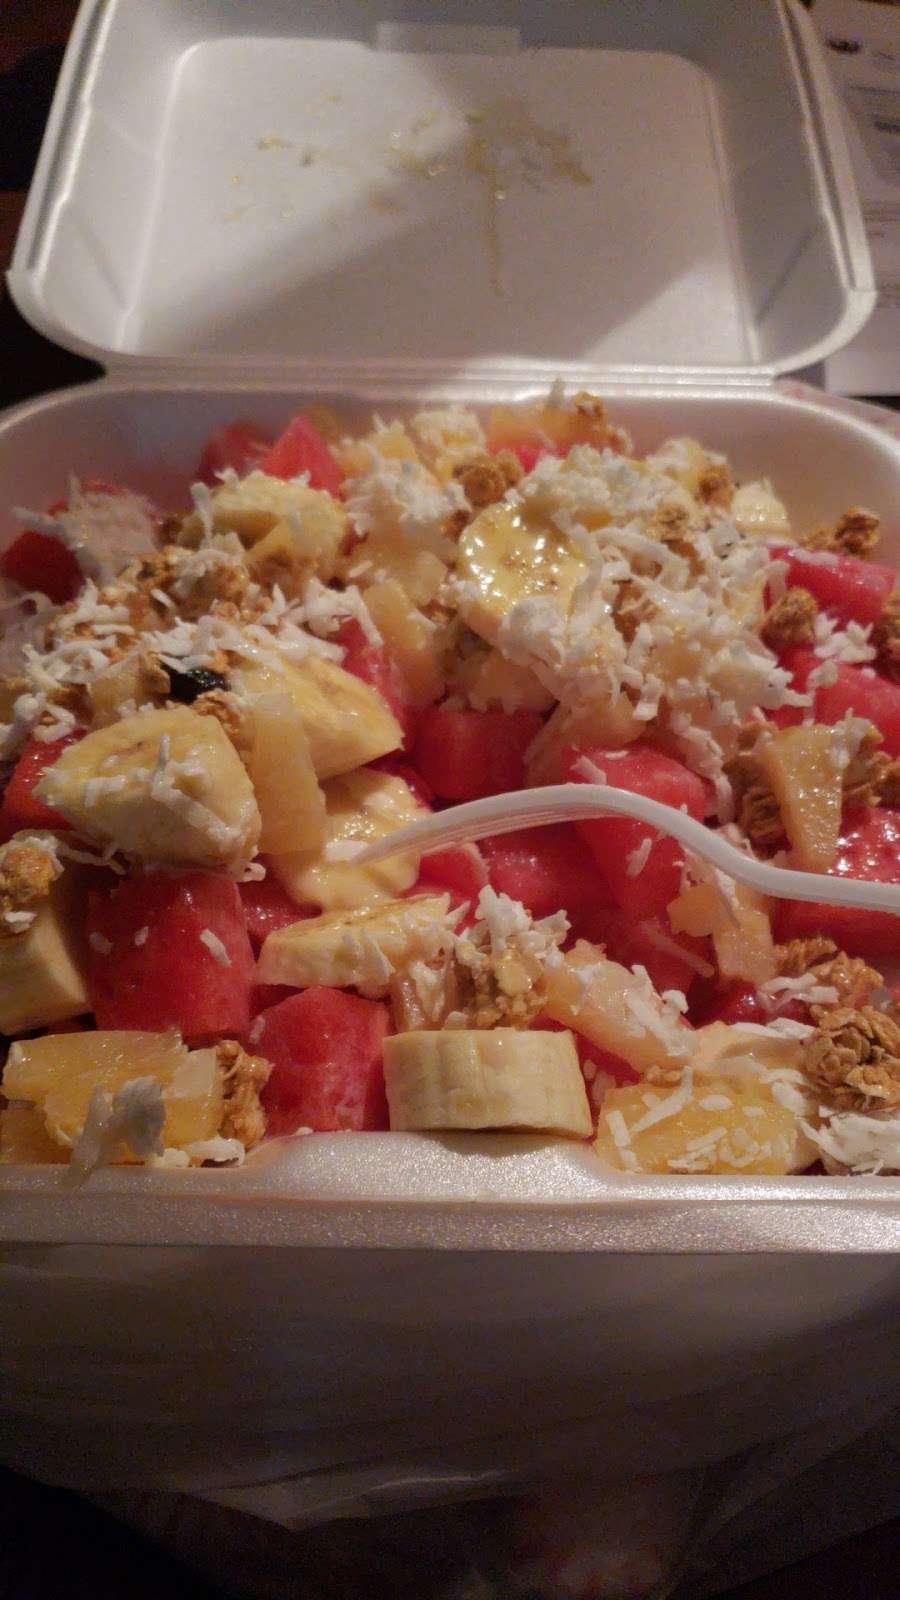 Gorditas El Tio - restaurant    Photo 6 of 9   Address: 3202 E Greenway Rd, Phoenix, AZ 85032, USA   Phone: (602) 867-9032